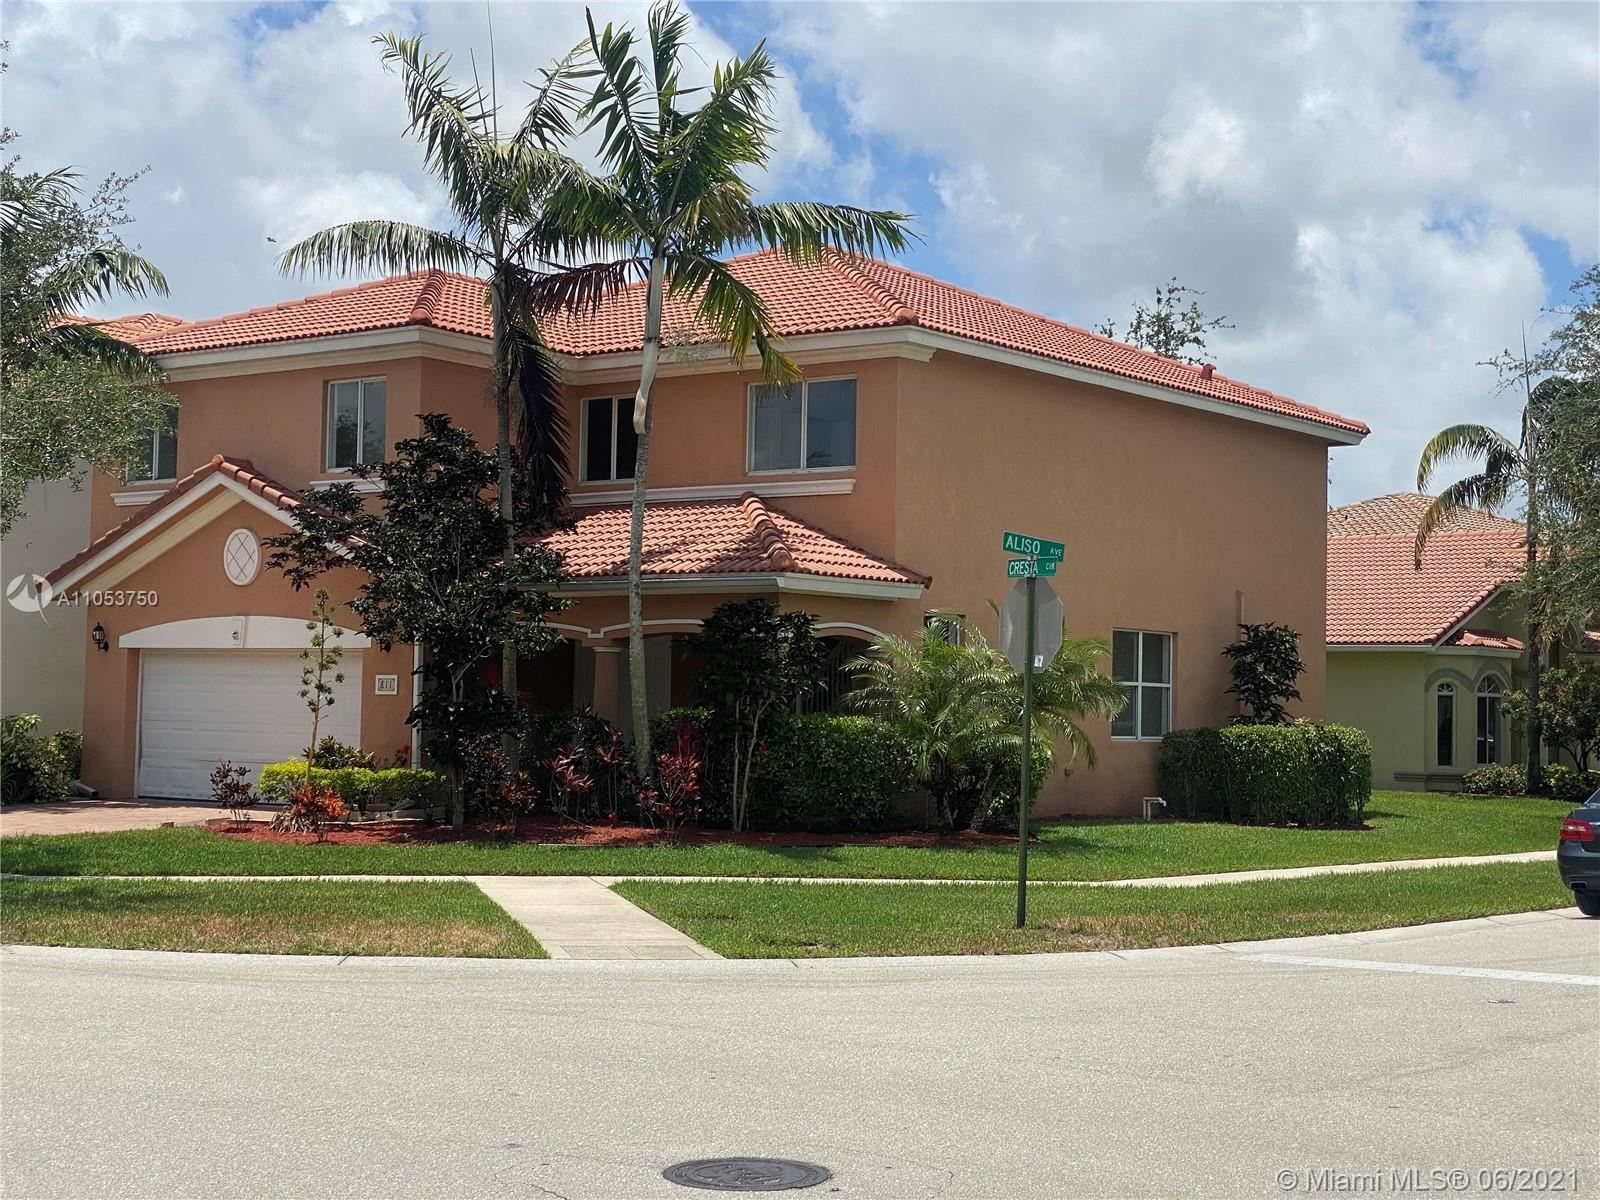 811 Cresta Cir, West Palm Beach, FL 33413 - #: A11053750